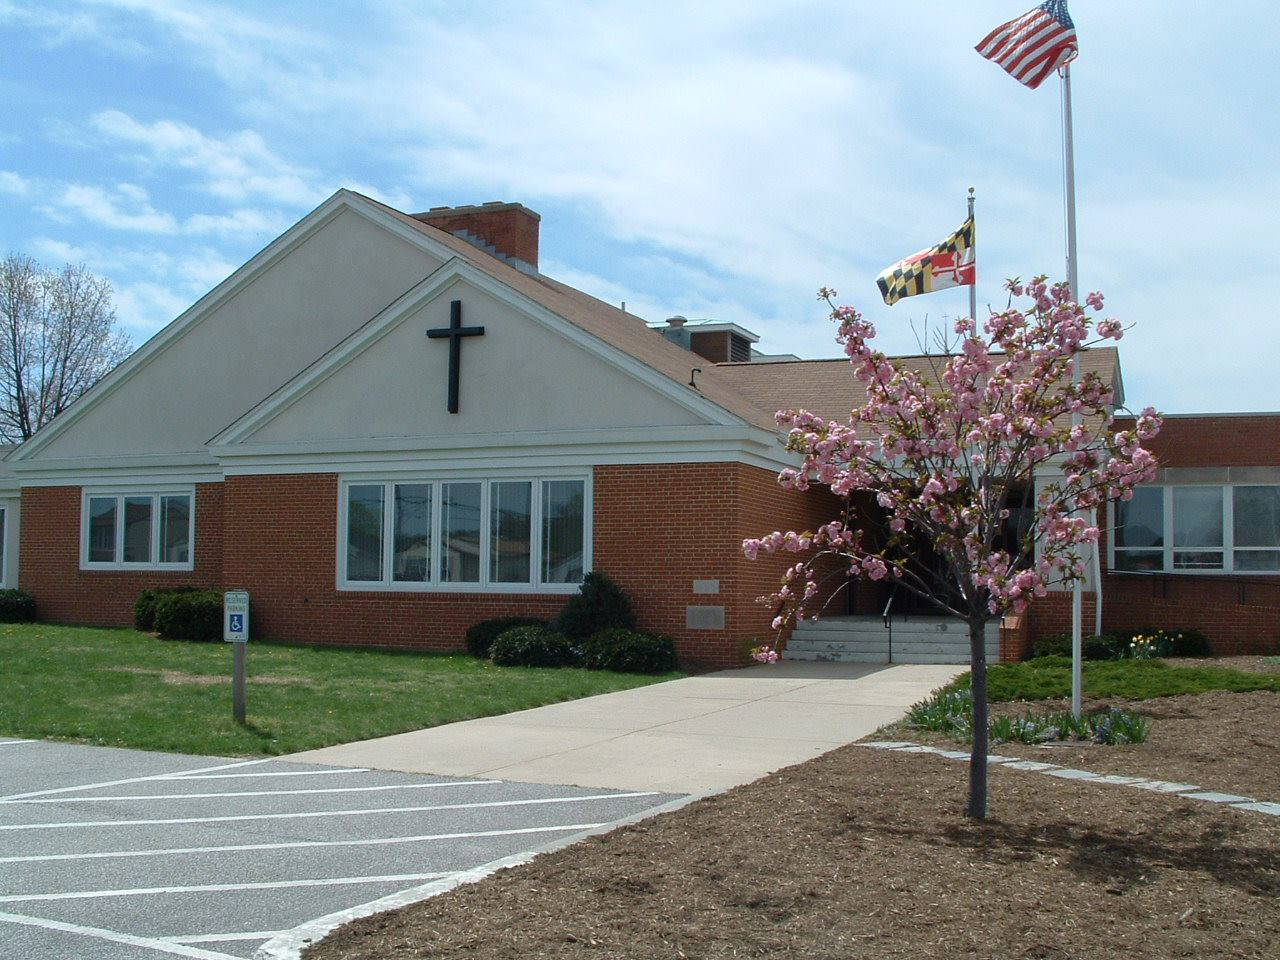 Glen Burnie Baptist Church